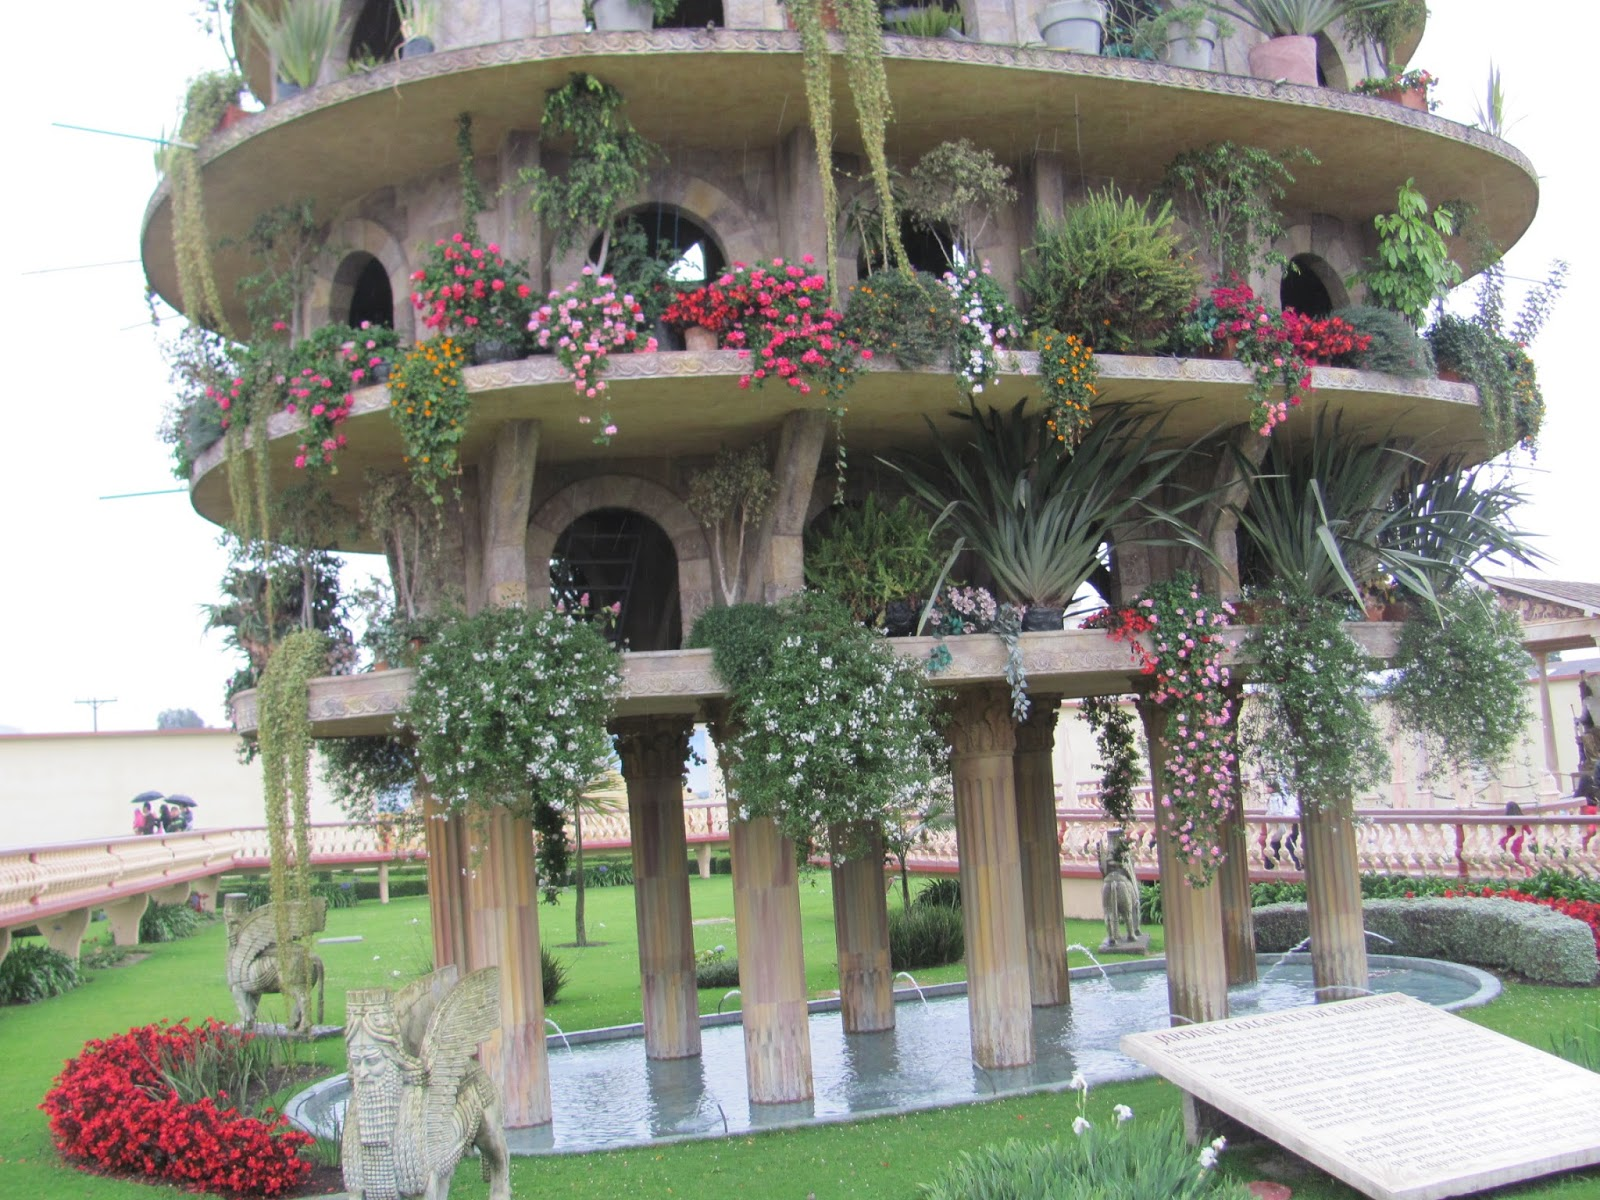 Viajes cortos bogota parque jaime duque for Jardines colgantes de babilonia